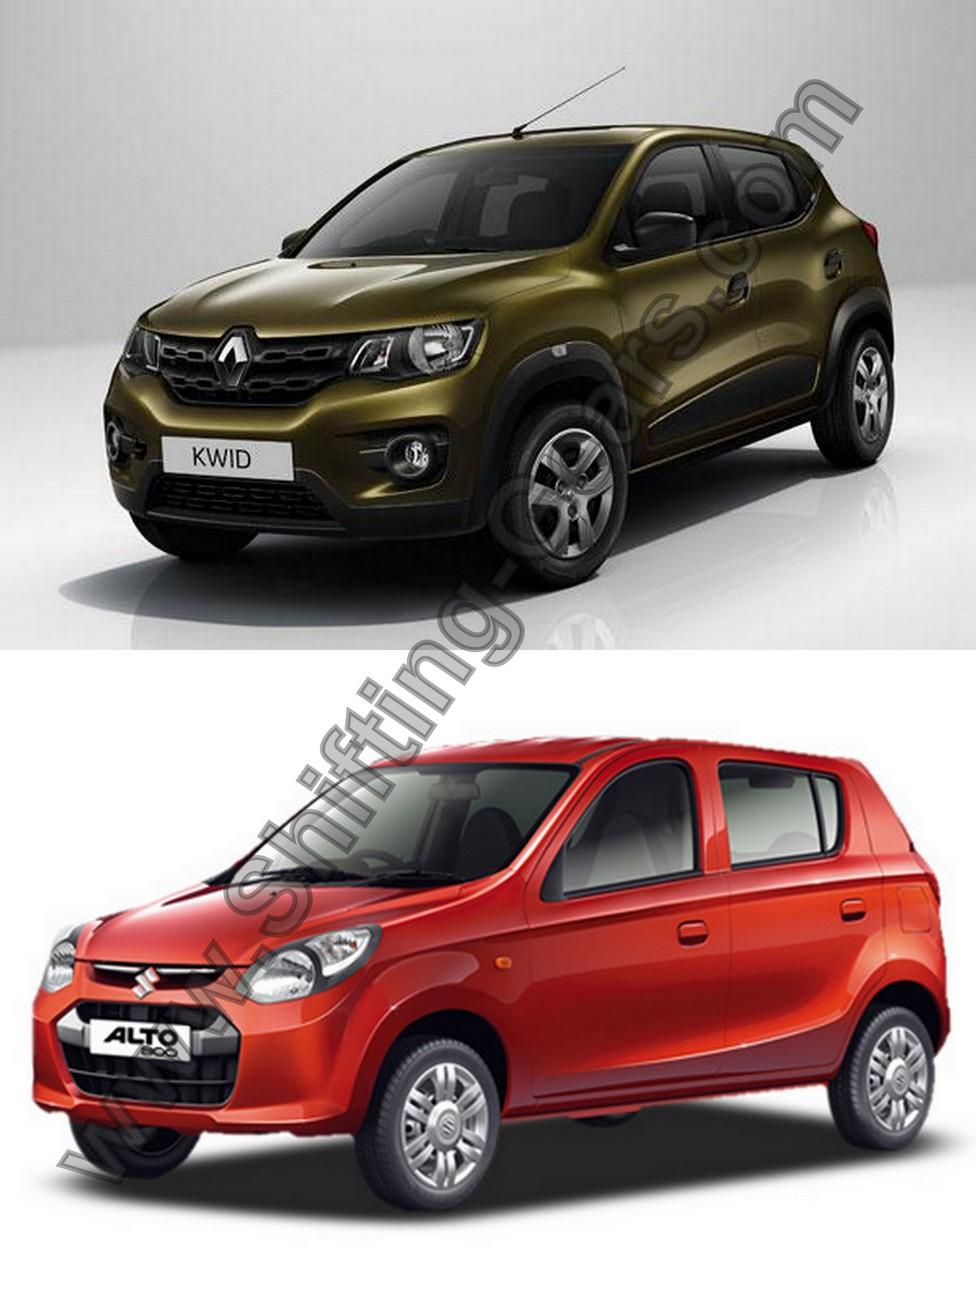 Renault Kwid Vs Alto 2017 Ototrendsnet